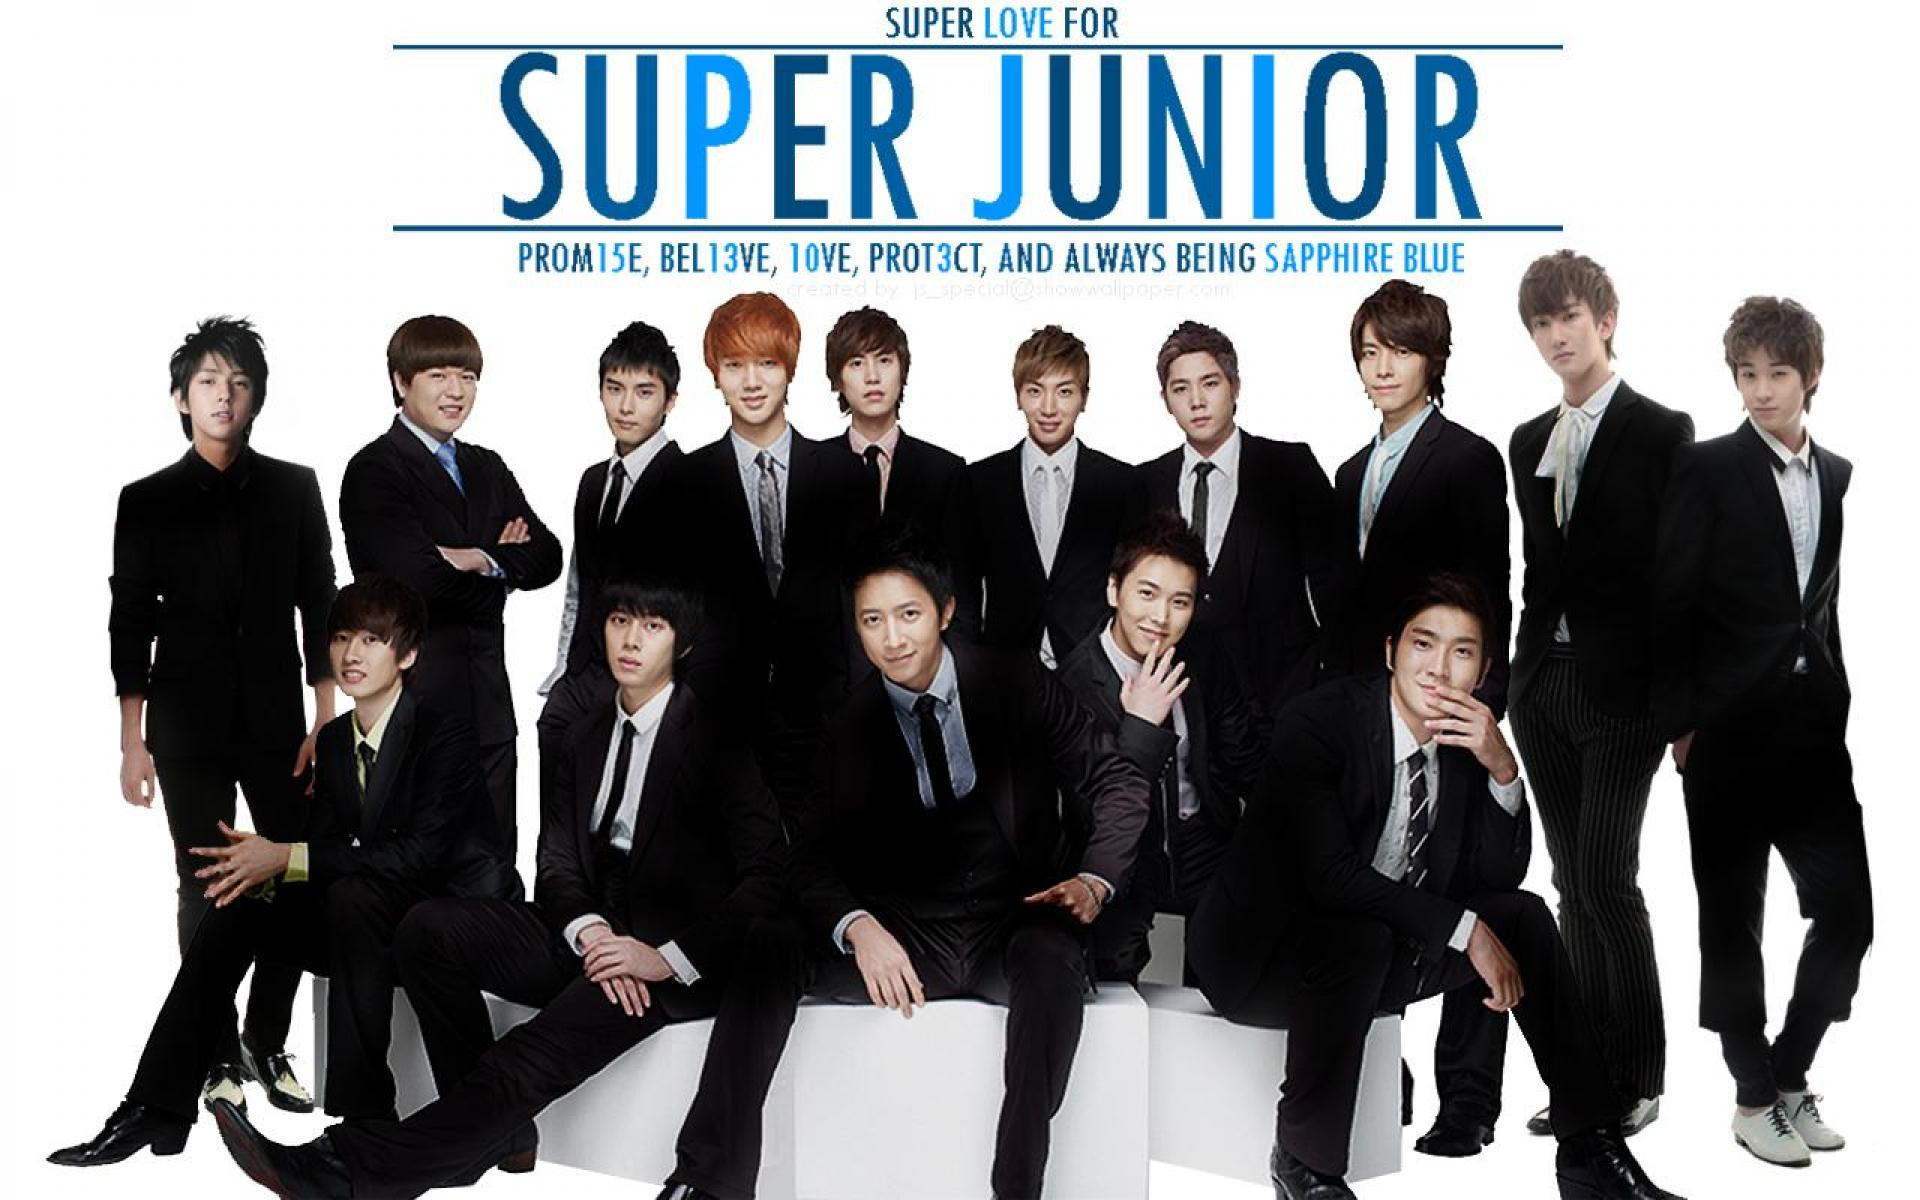 Wallpaper Tags: yesung kyuhyun heechul ryeowook korean sungmin suju k pop eunhyuk super leeteuk siwon korea donghae junior shindong kpop